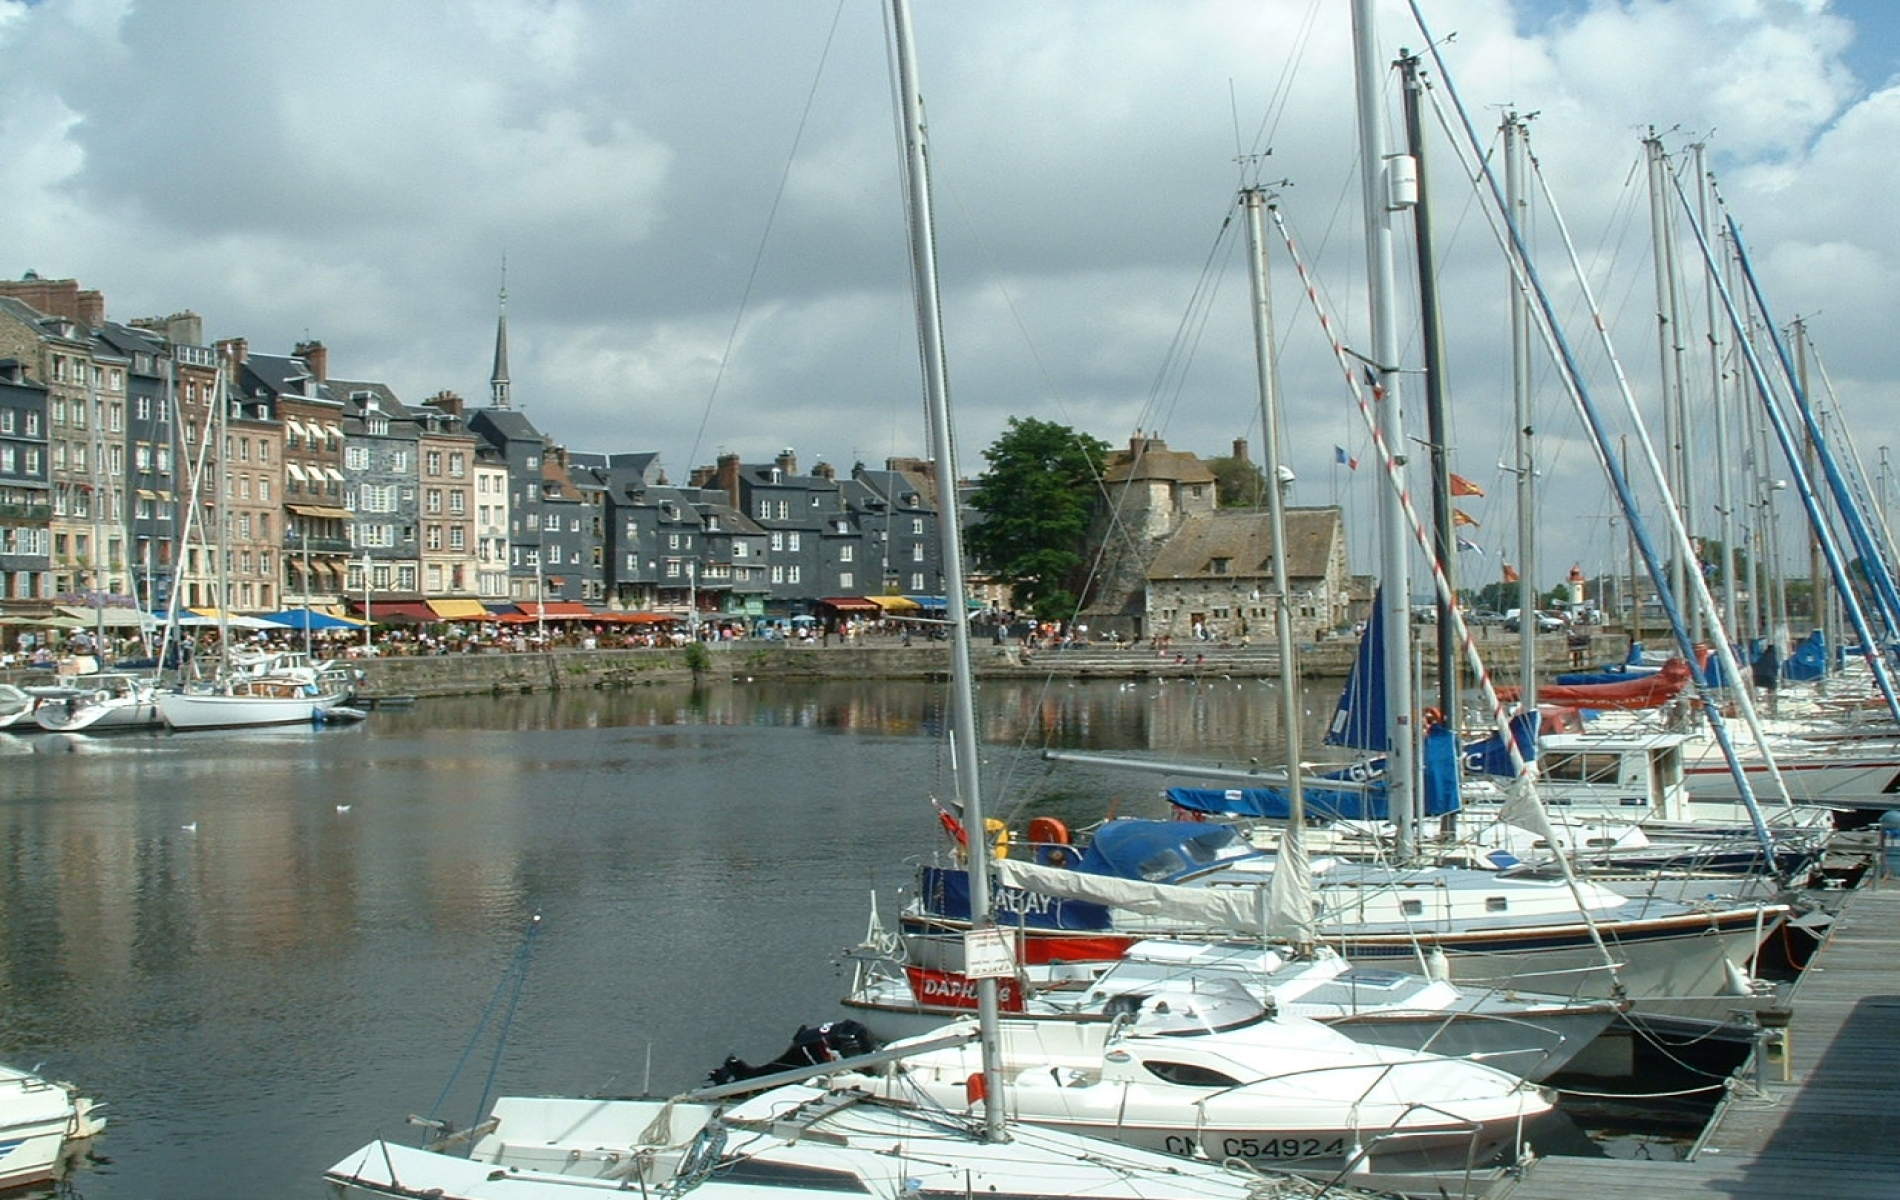 Hafen van Honfleur